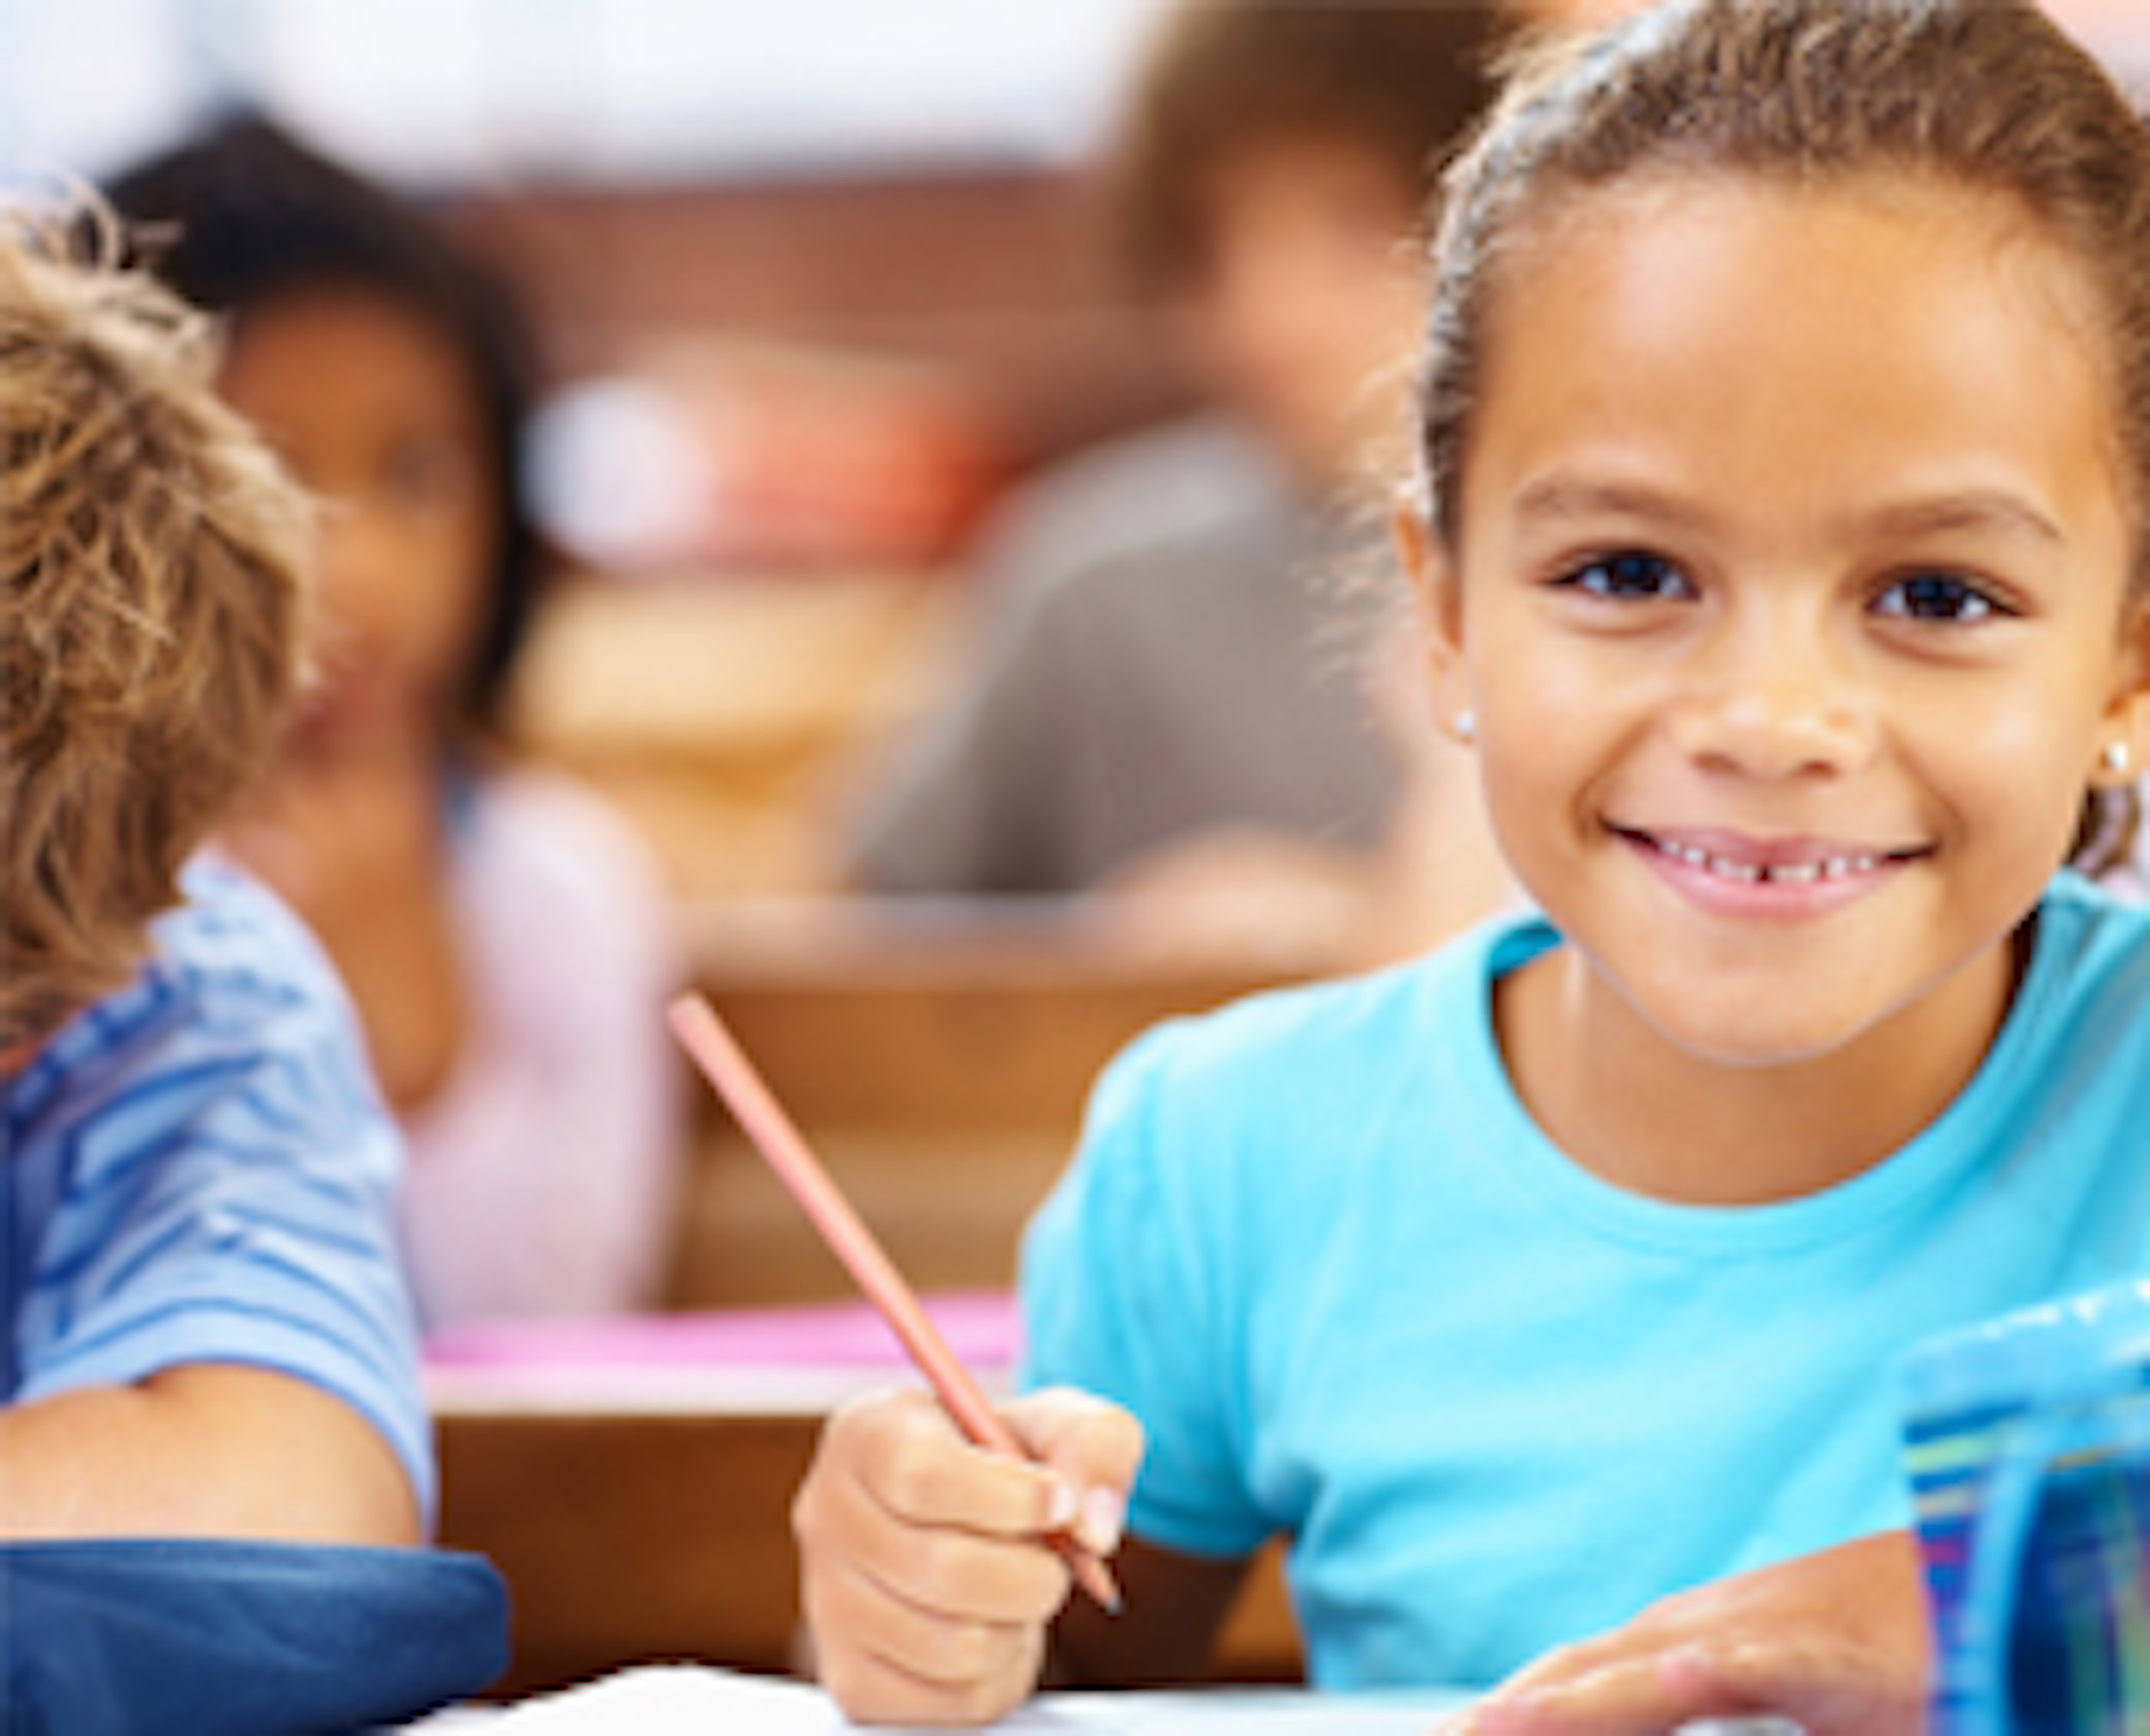 happy-child-writing-260x210_tcm4-623105.jpg